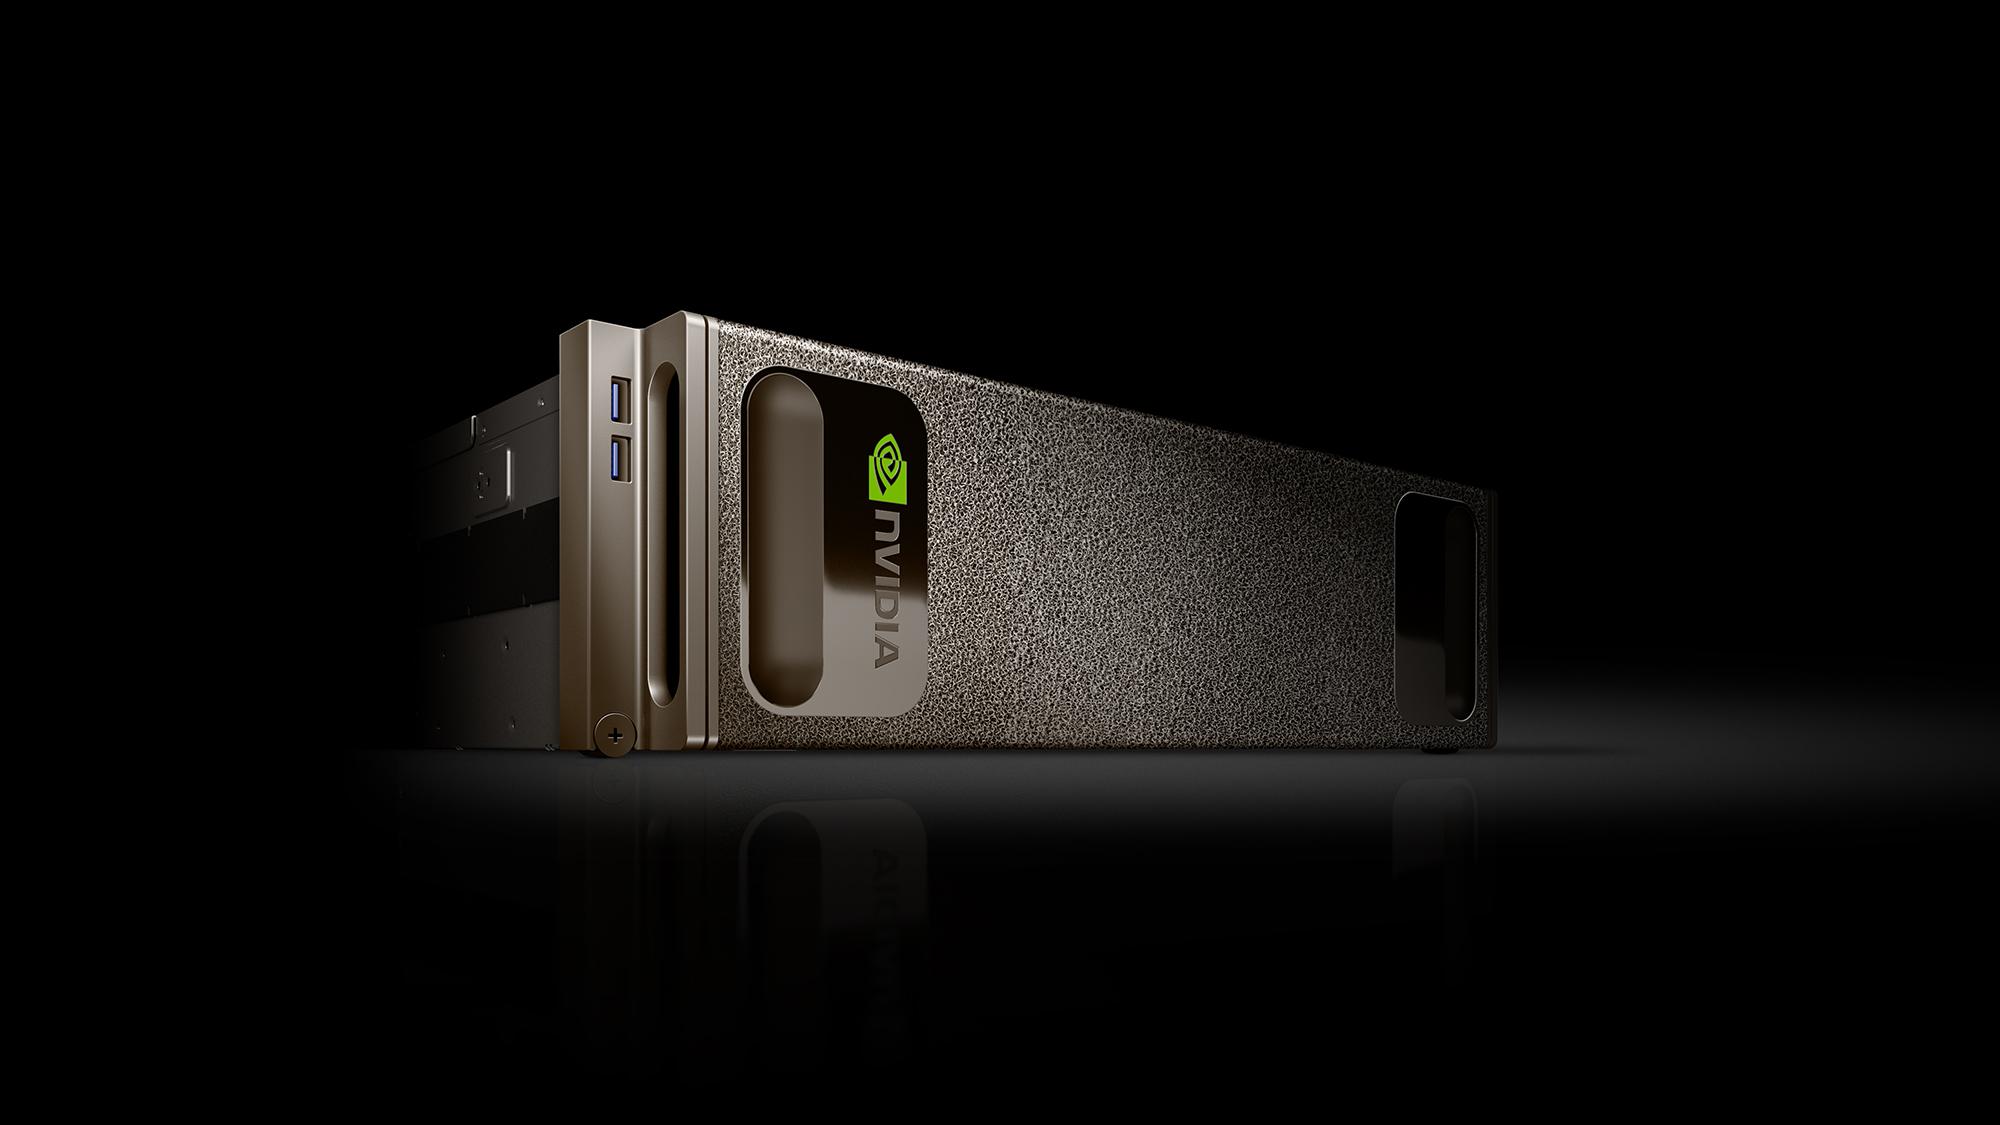 NVIDIA DGX-1 AI supercomputer.